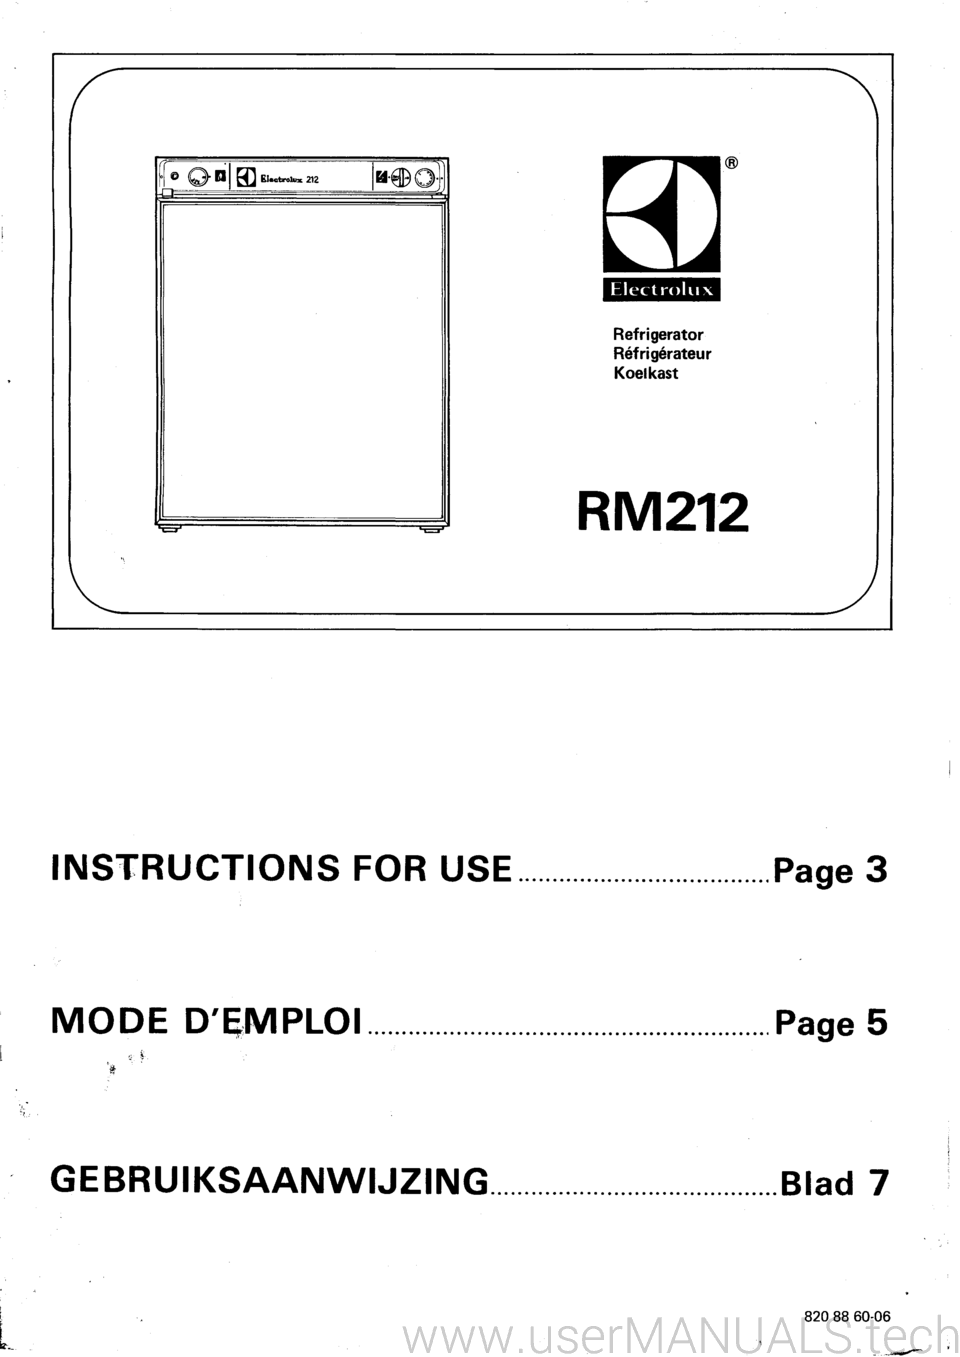 electrolux 3 way fridge rm212 instruction manual rh usermanuals tech Electrolux Refrigerators Parts Catalog Electrolux Professional Refrigerator